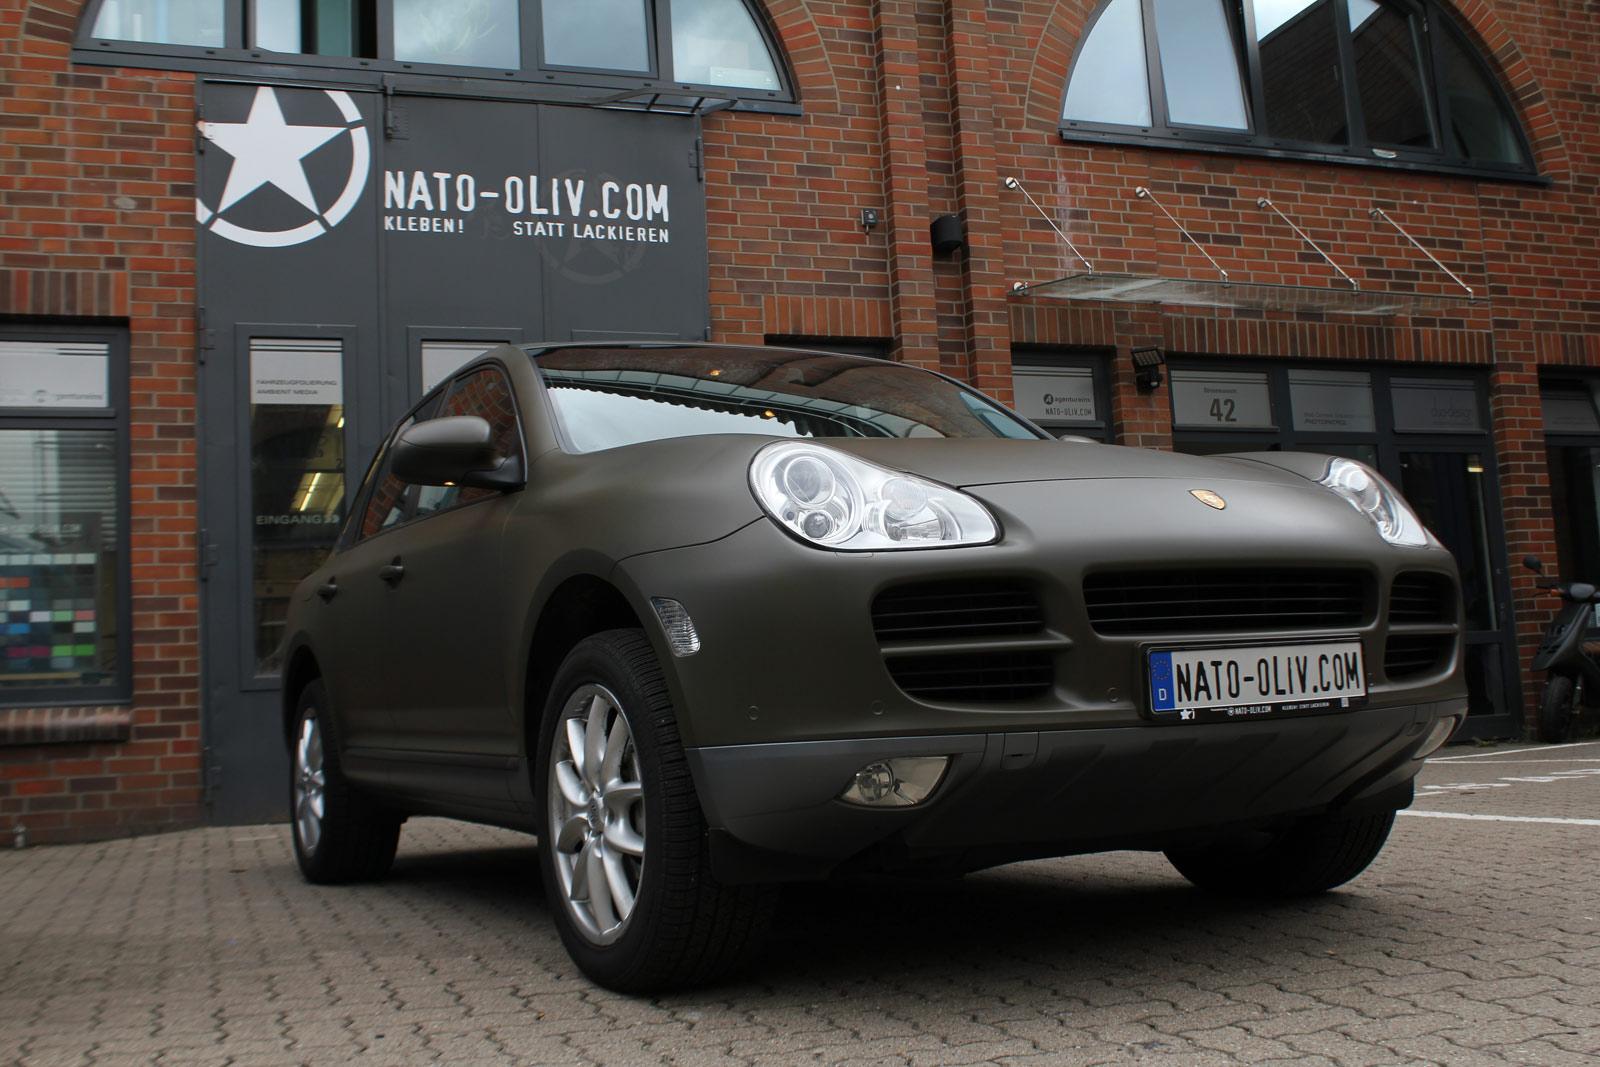 Porsche_Cayenne_Folierung_Nato-Oliv_Matt_10